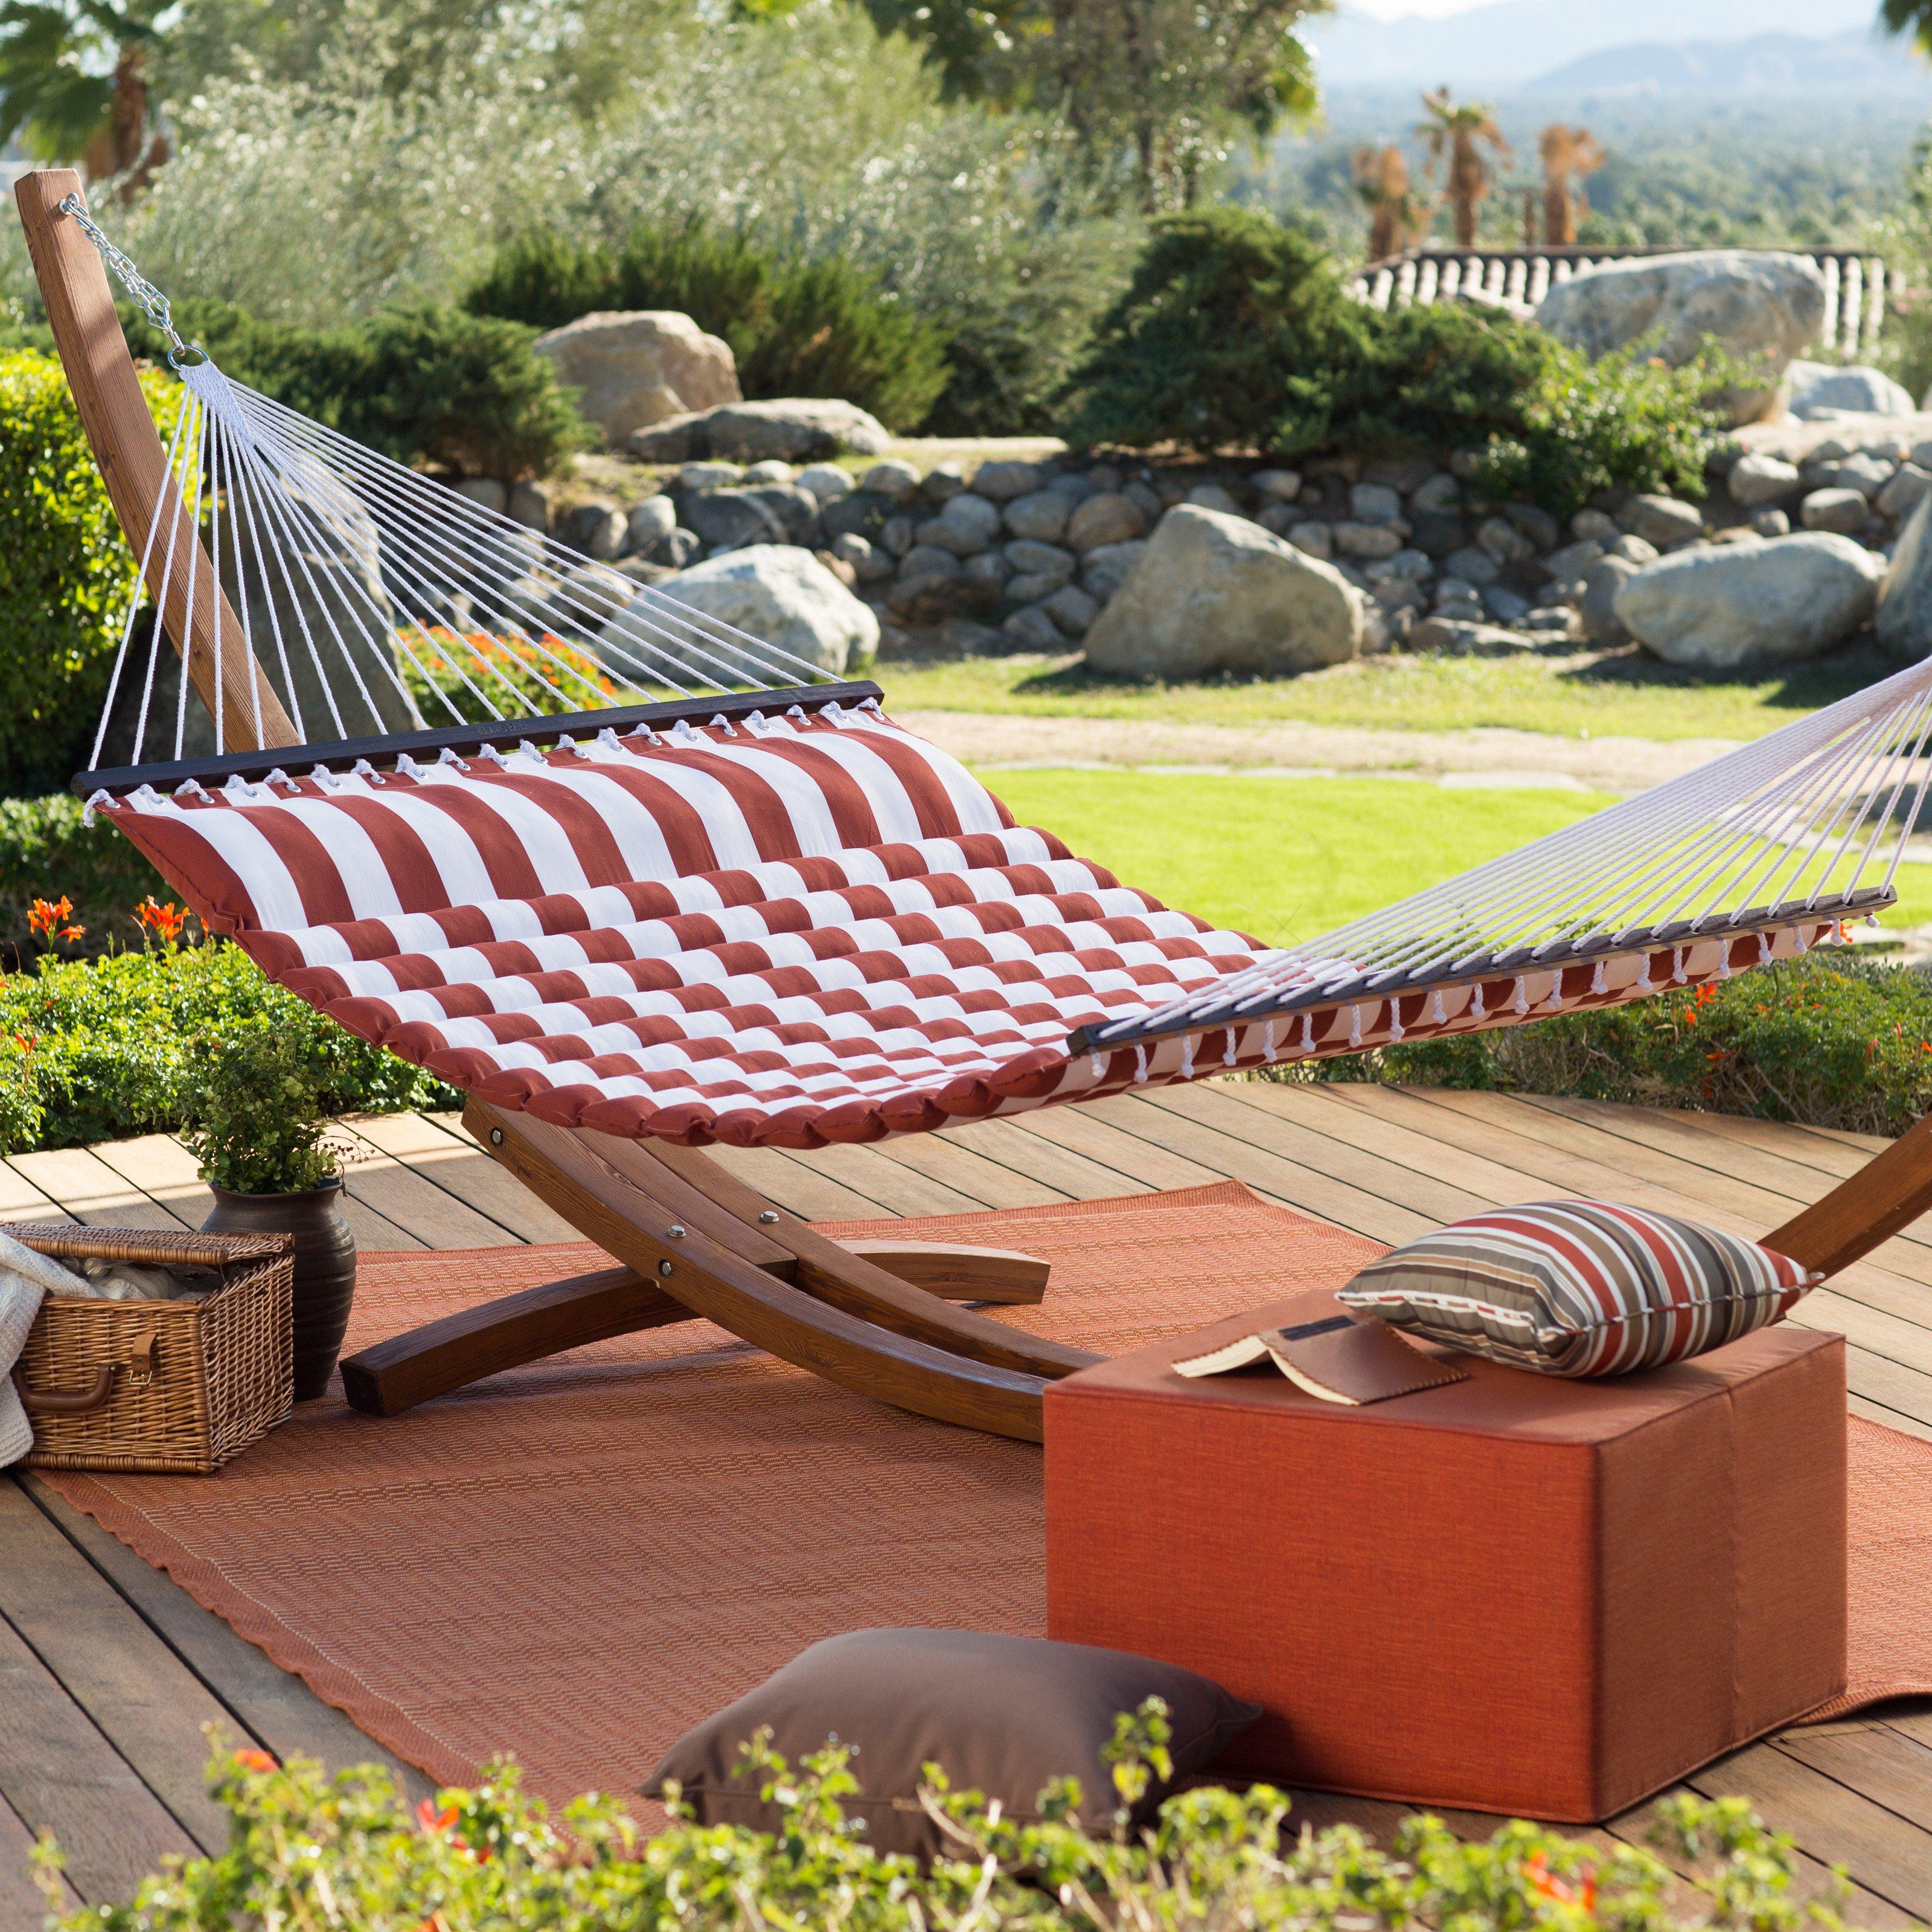 Alfred Zahn Island Bay 13-ft. Thick Stripe Pillow-Top 2 P...